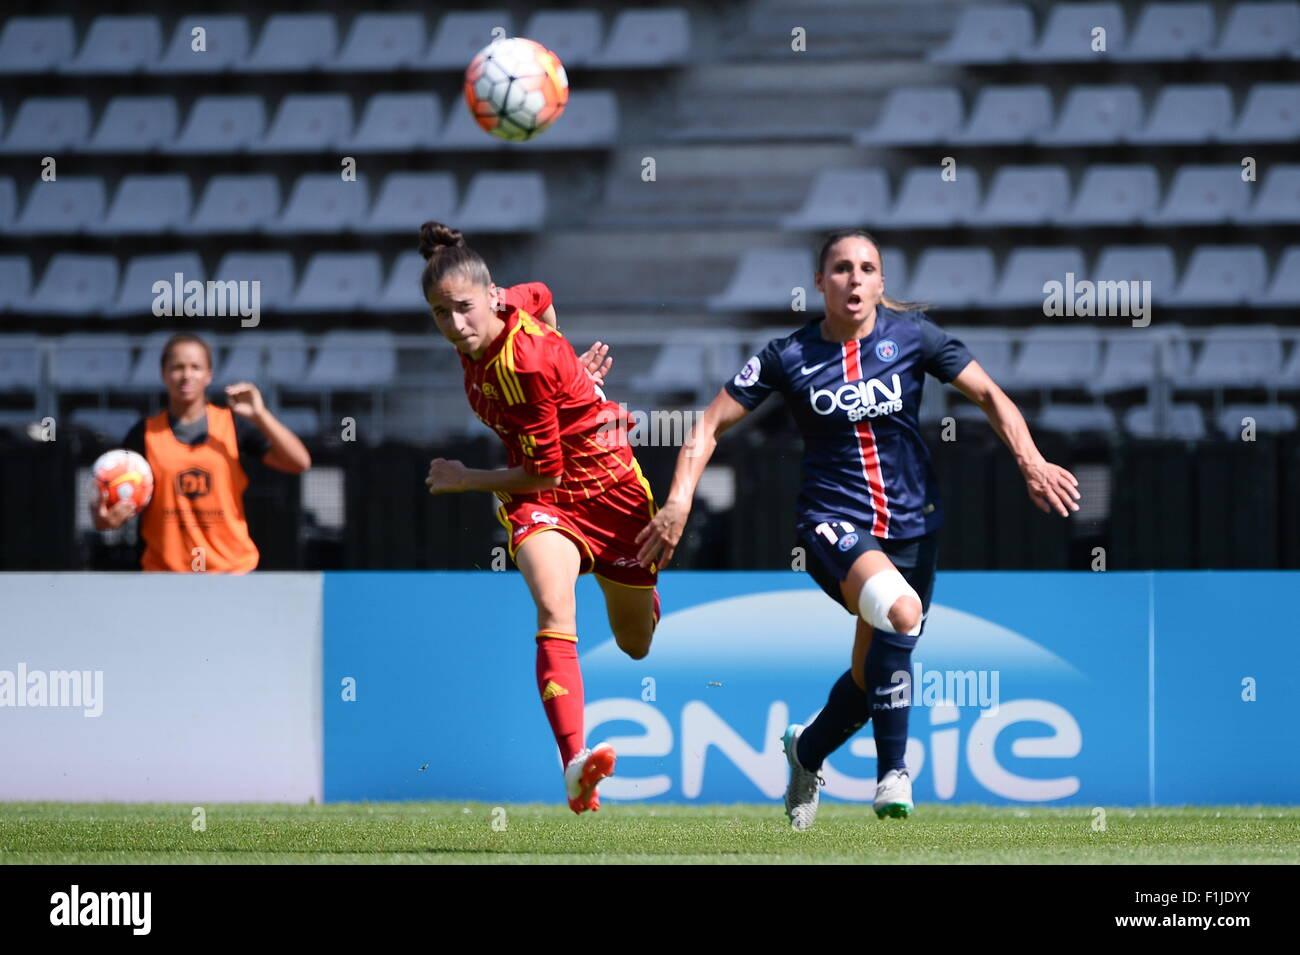 Jessica HOUARA D HOMMEAUX - 30.08.2015 - PSG/Rodez - 1ere journee D1 Feminine.Photo : Nolwenn Le Gouic/Icon Sport - Stock Image